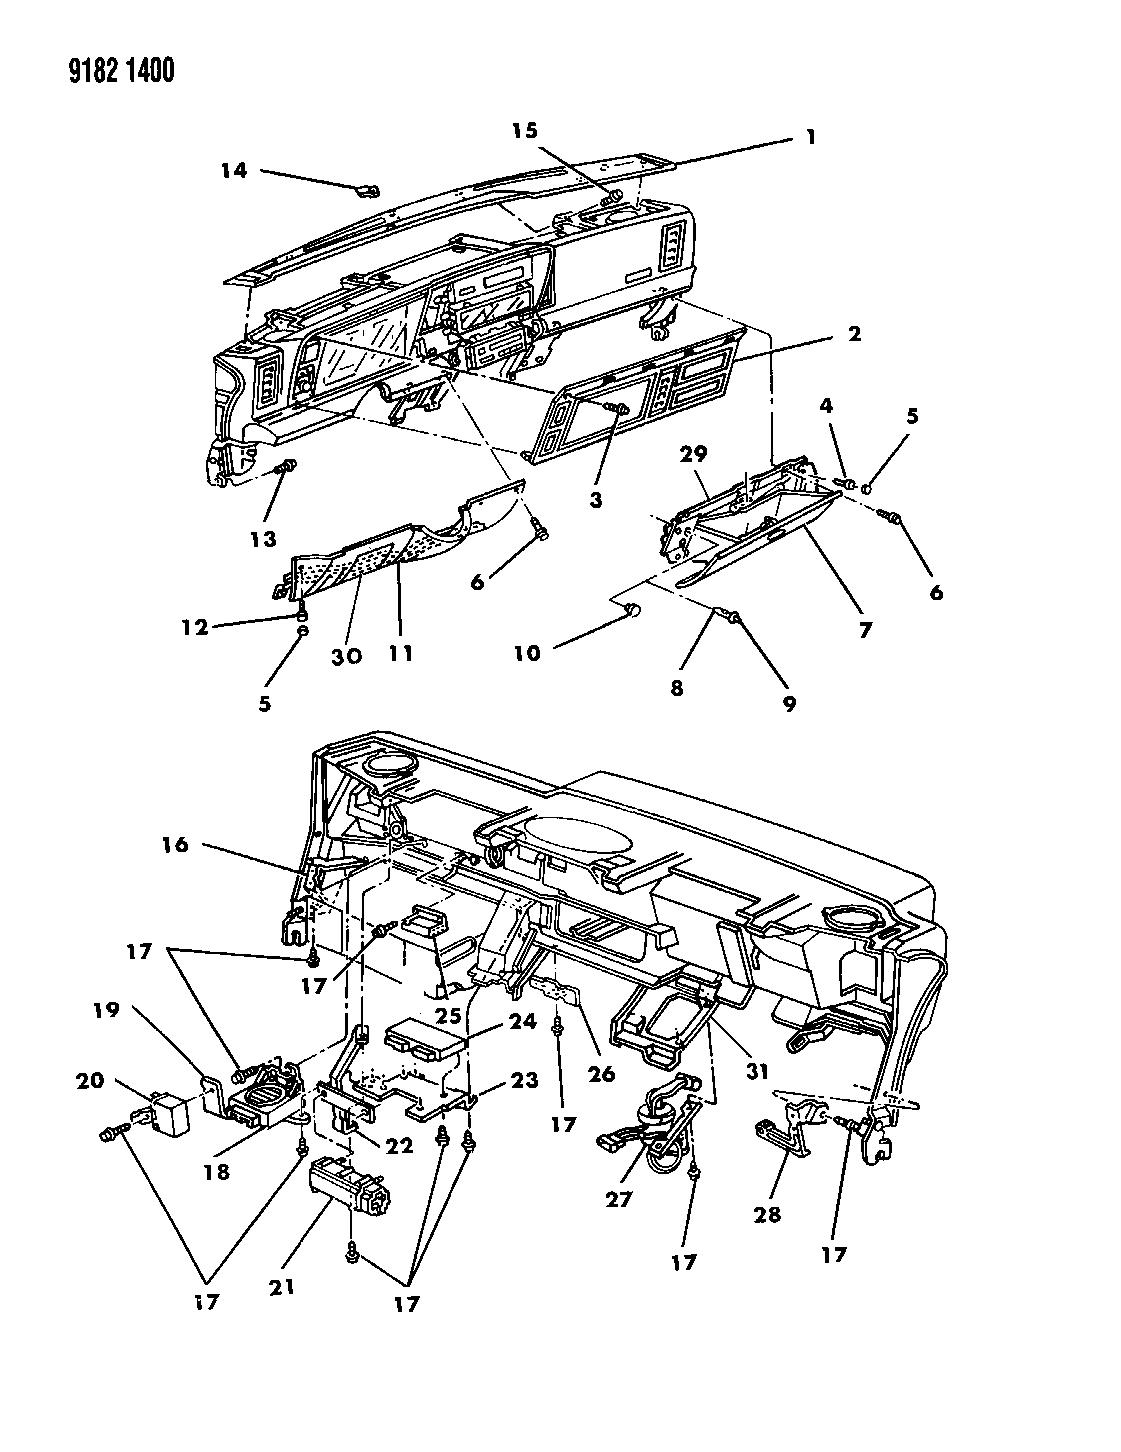 1989 Chrysler Lebaron Gtc Instrument Panel Bezels Glovebox And Wiring Diagram Controls